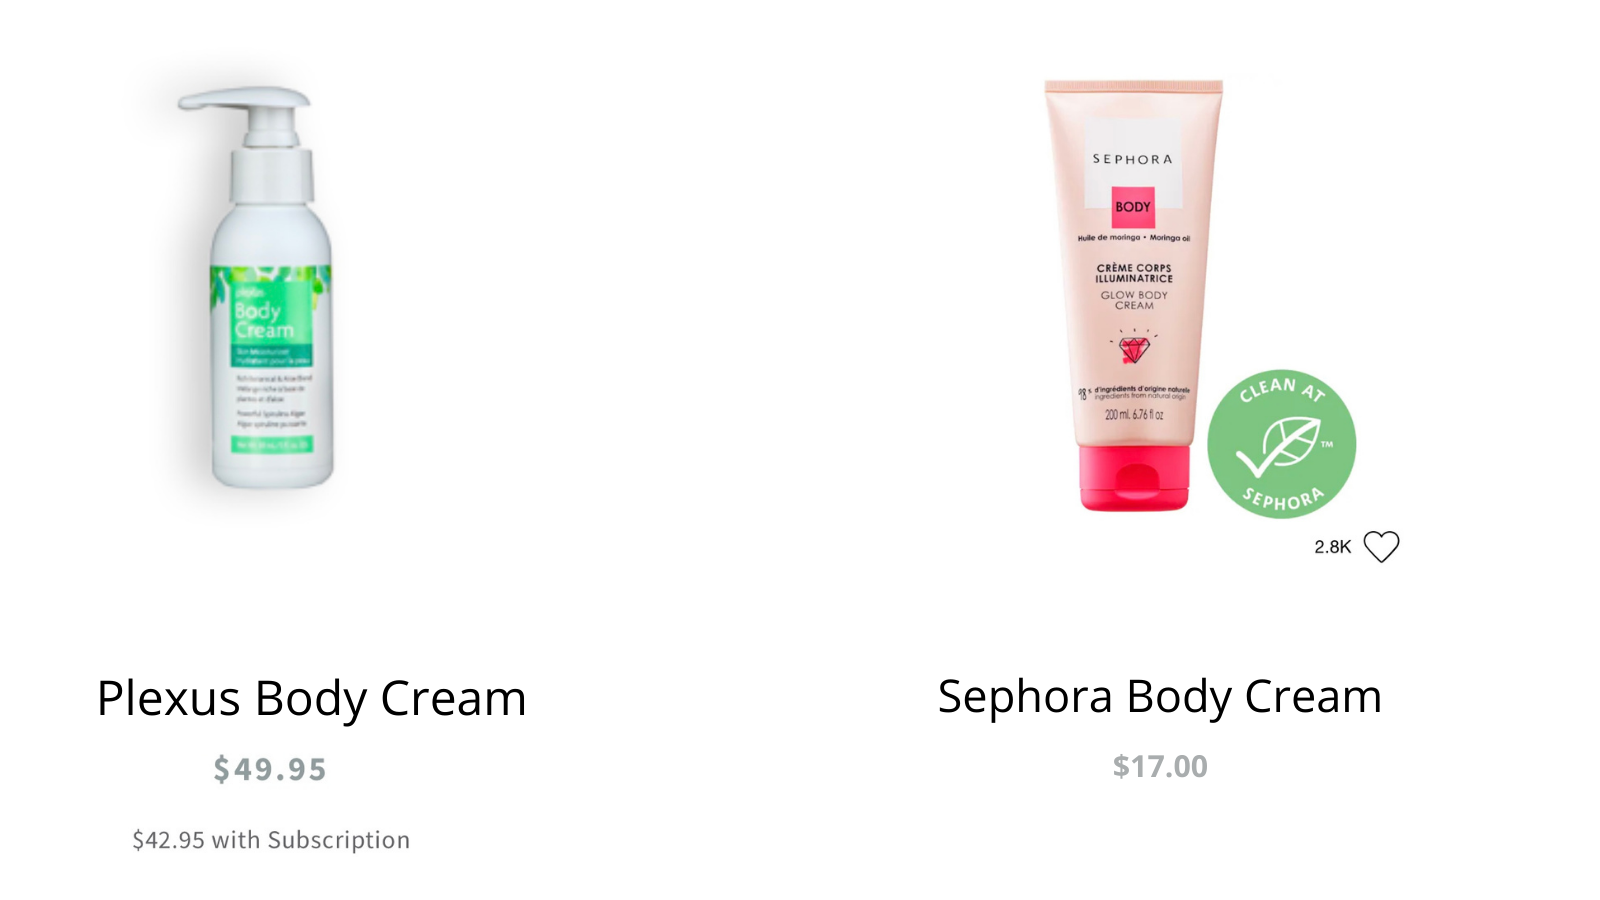 Sephora-Body-Cream